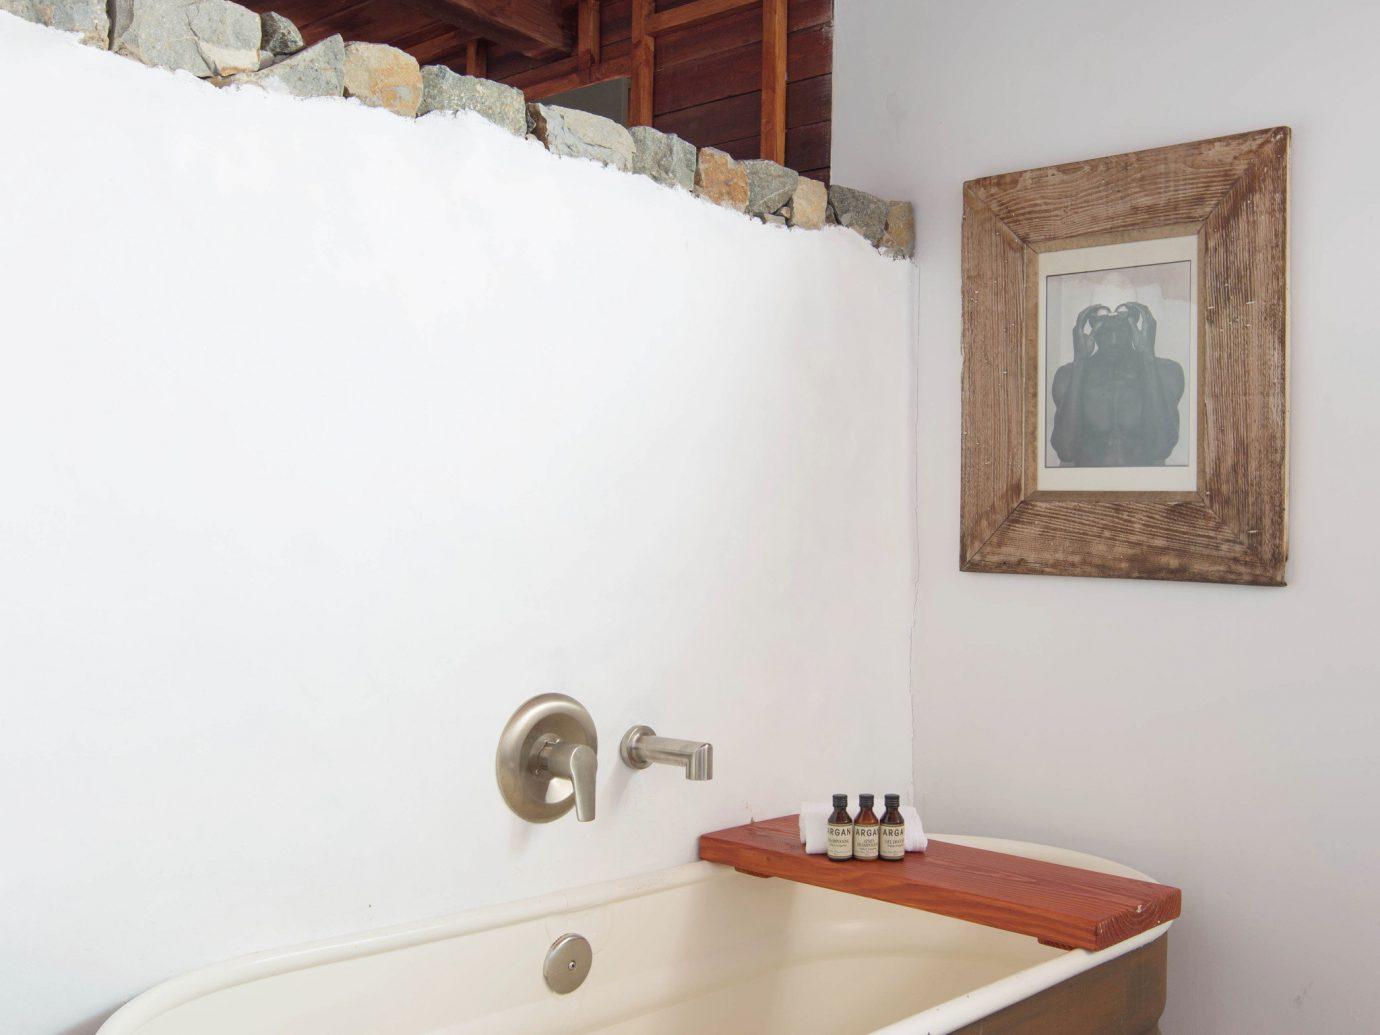 Influencers + Tastemakers Travel Shop Trip Ideas wall indoor bathroom room property house floor sink hardwood home cottage estate real estate interior design bathtub